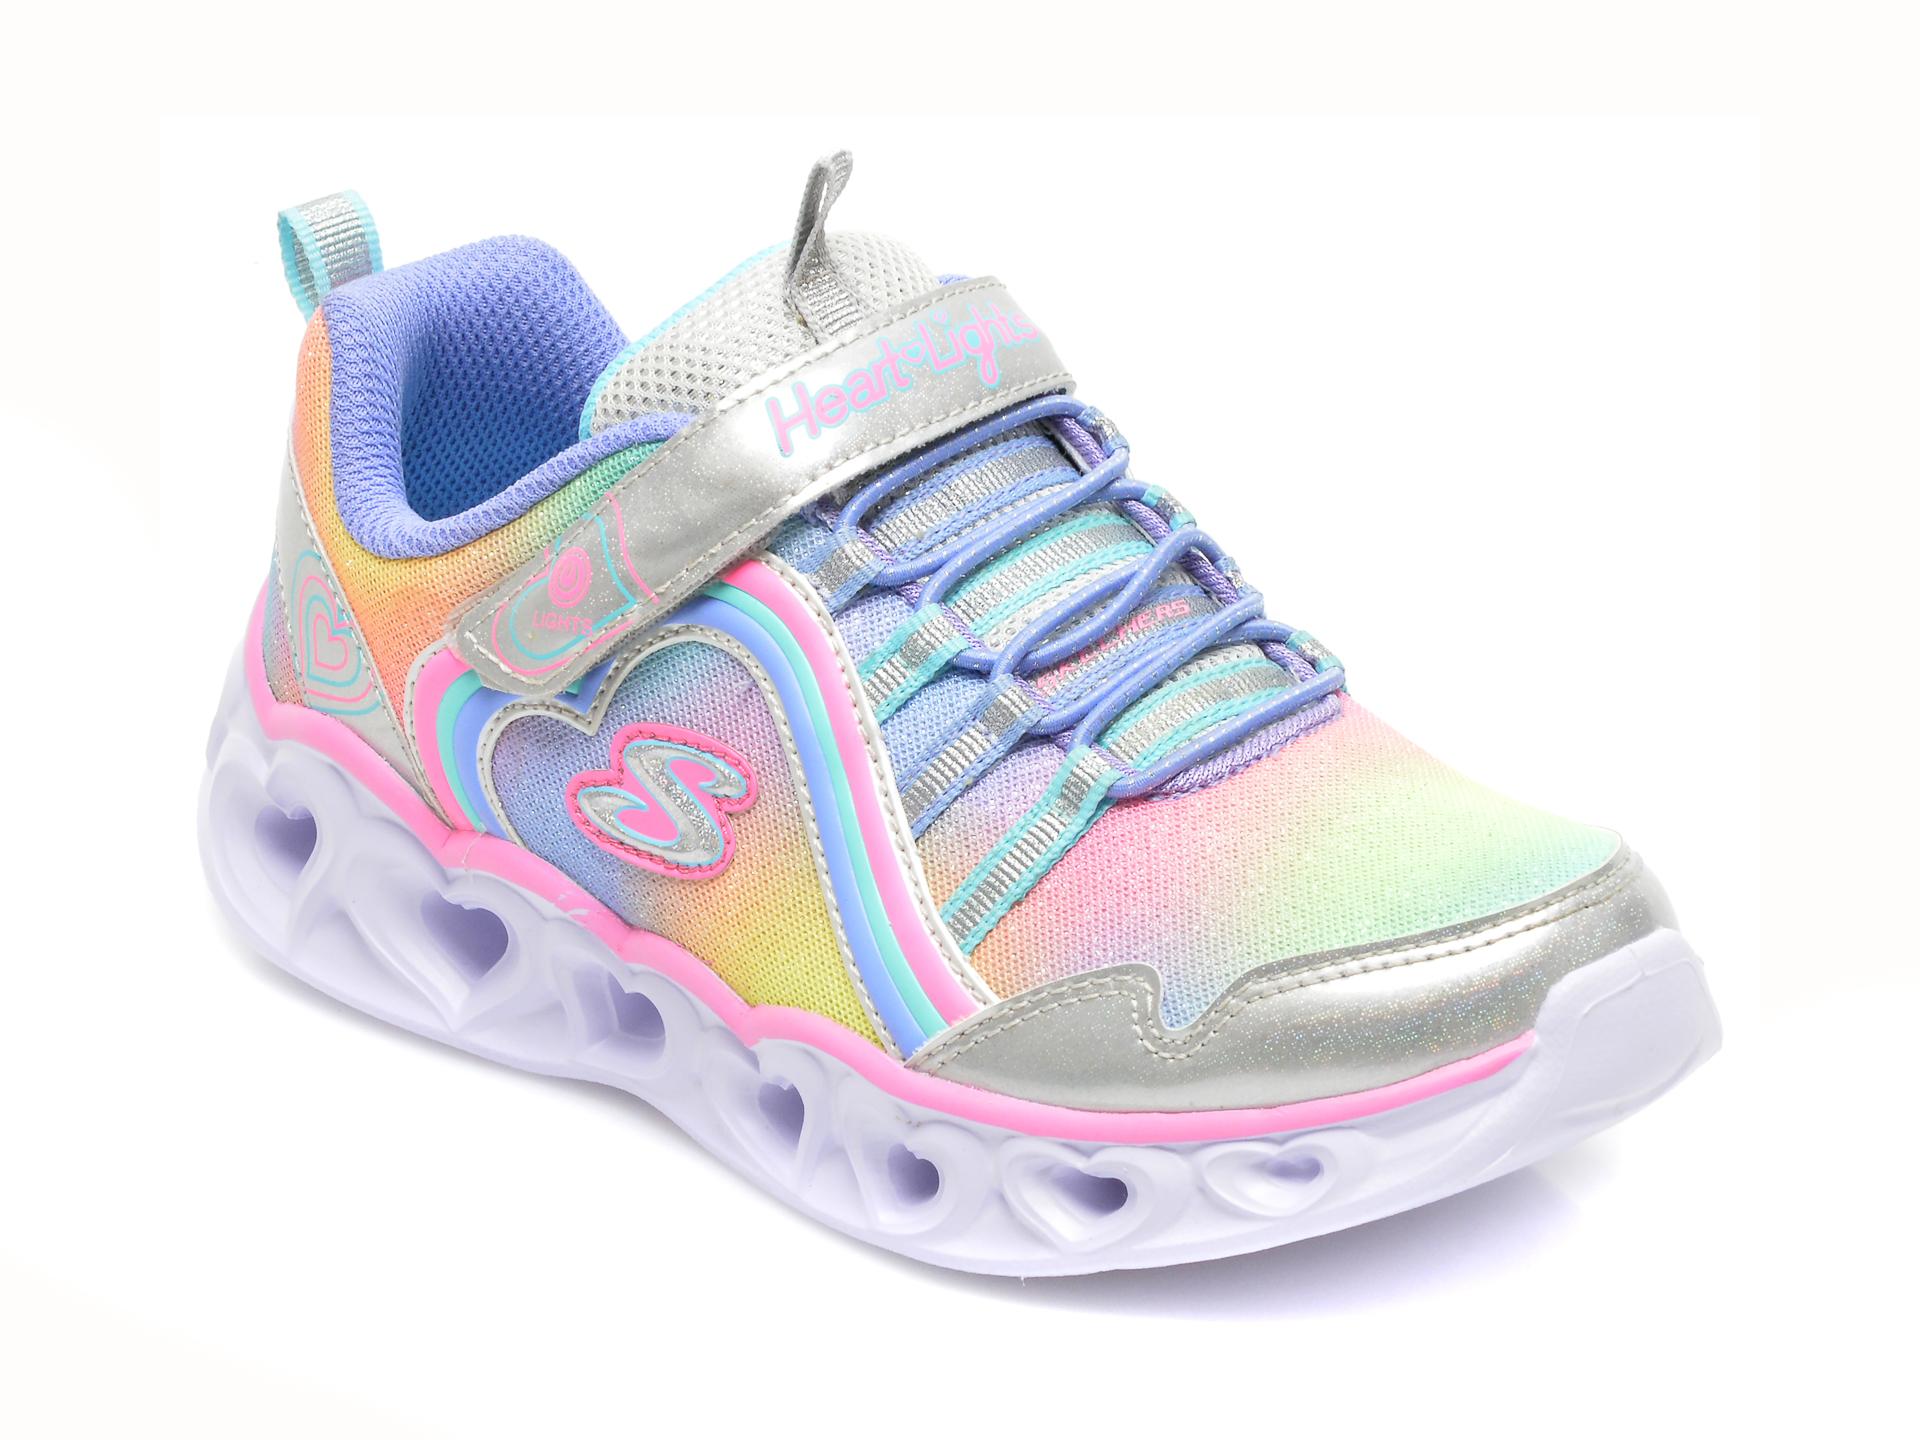 Pantofi sport SKECHERS multicolori, HEART LIGHTS, din material textil si piele ecologica